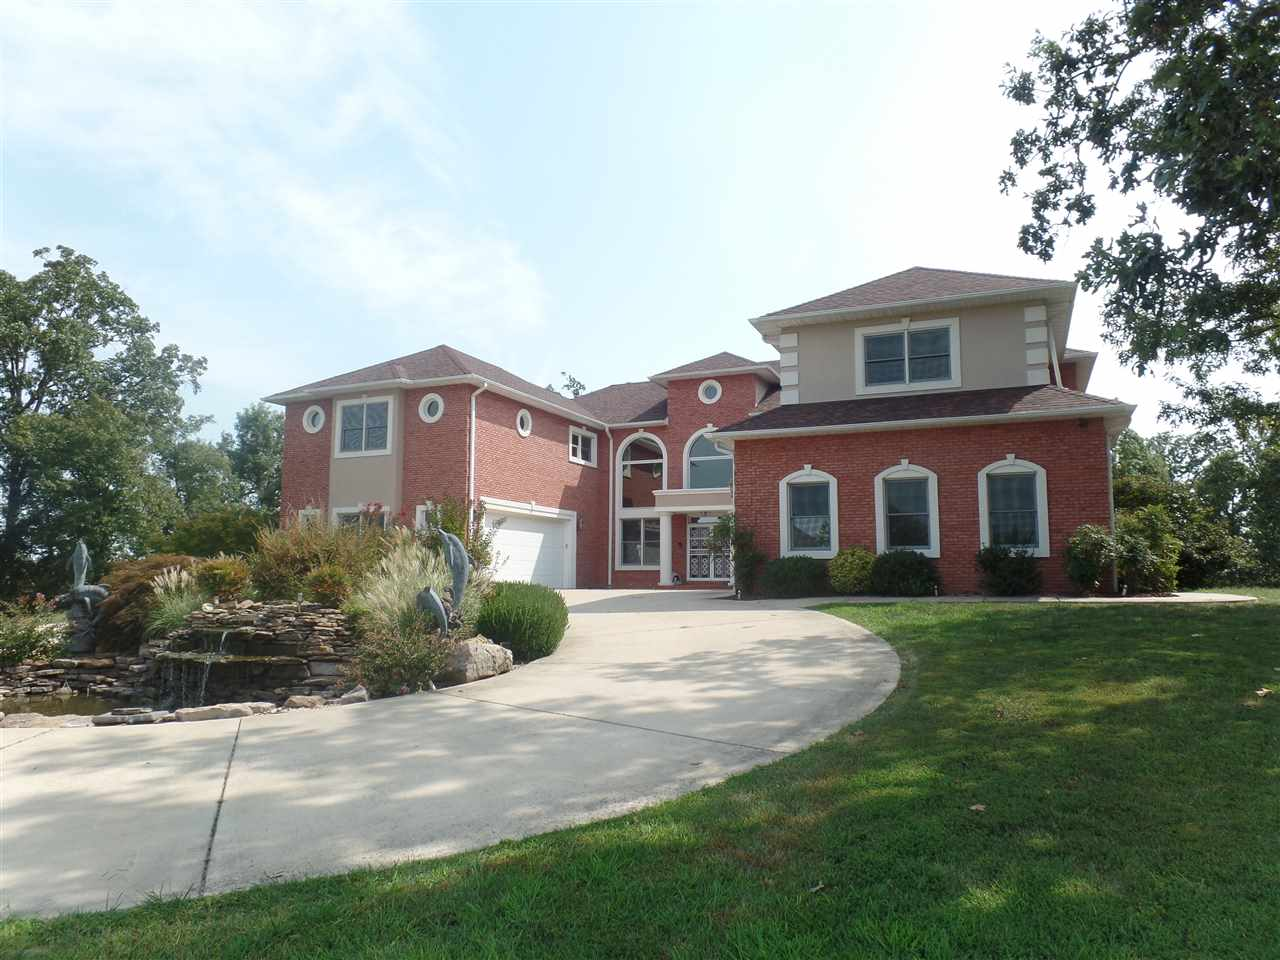 Real Estate for Sale, ListingId: 35179984, Poplar Bluff,MO63901